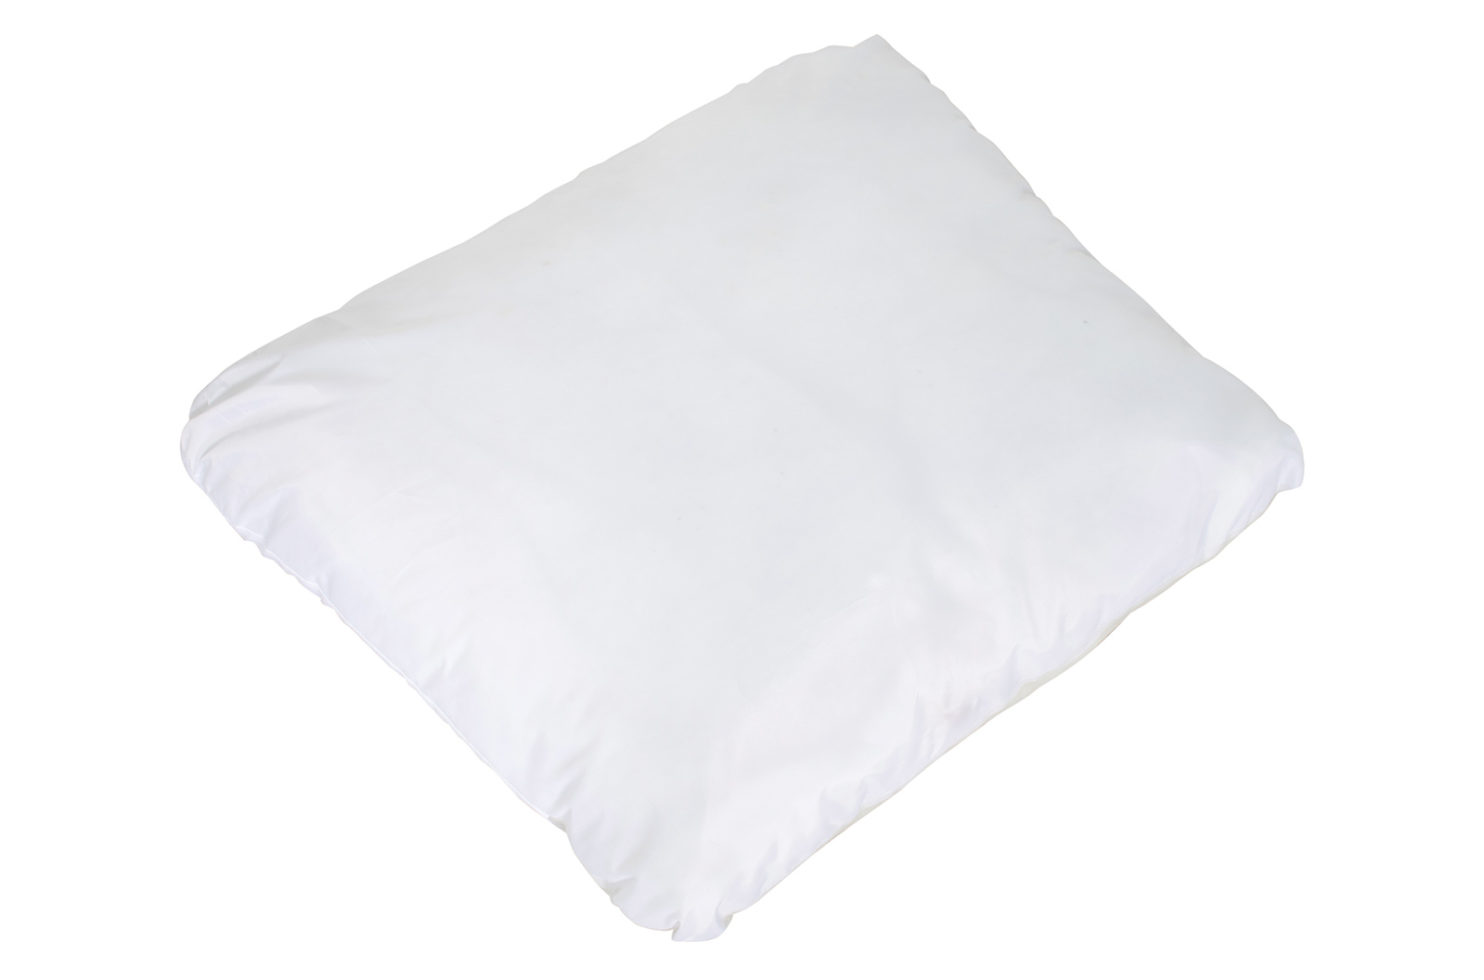 capri lounge frame 620FT091P2 dtl2 back cushion